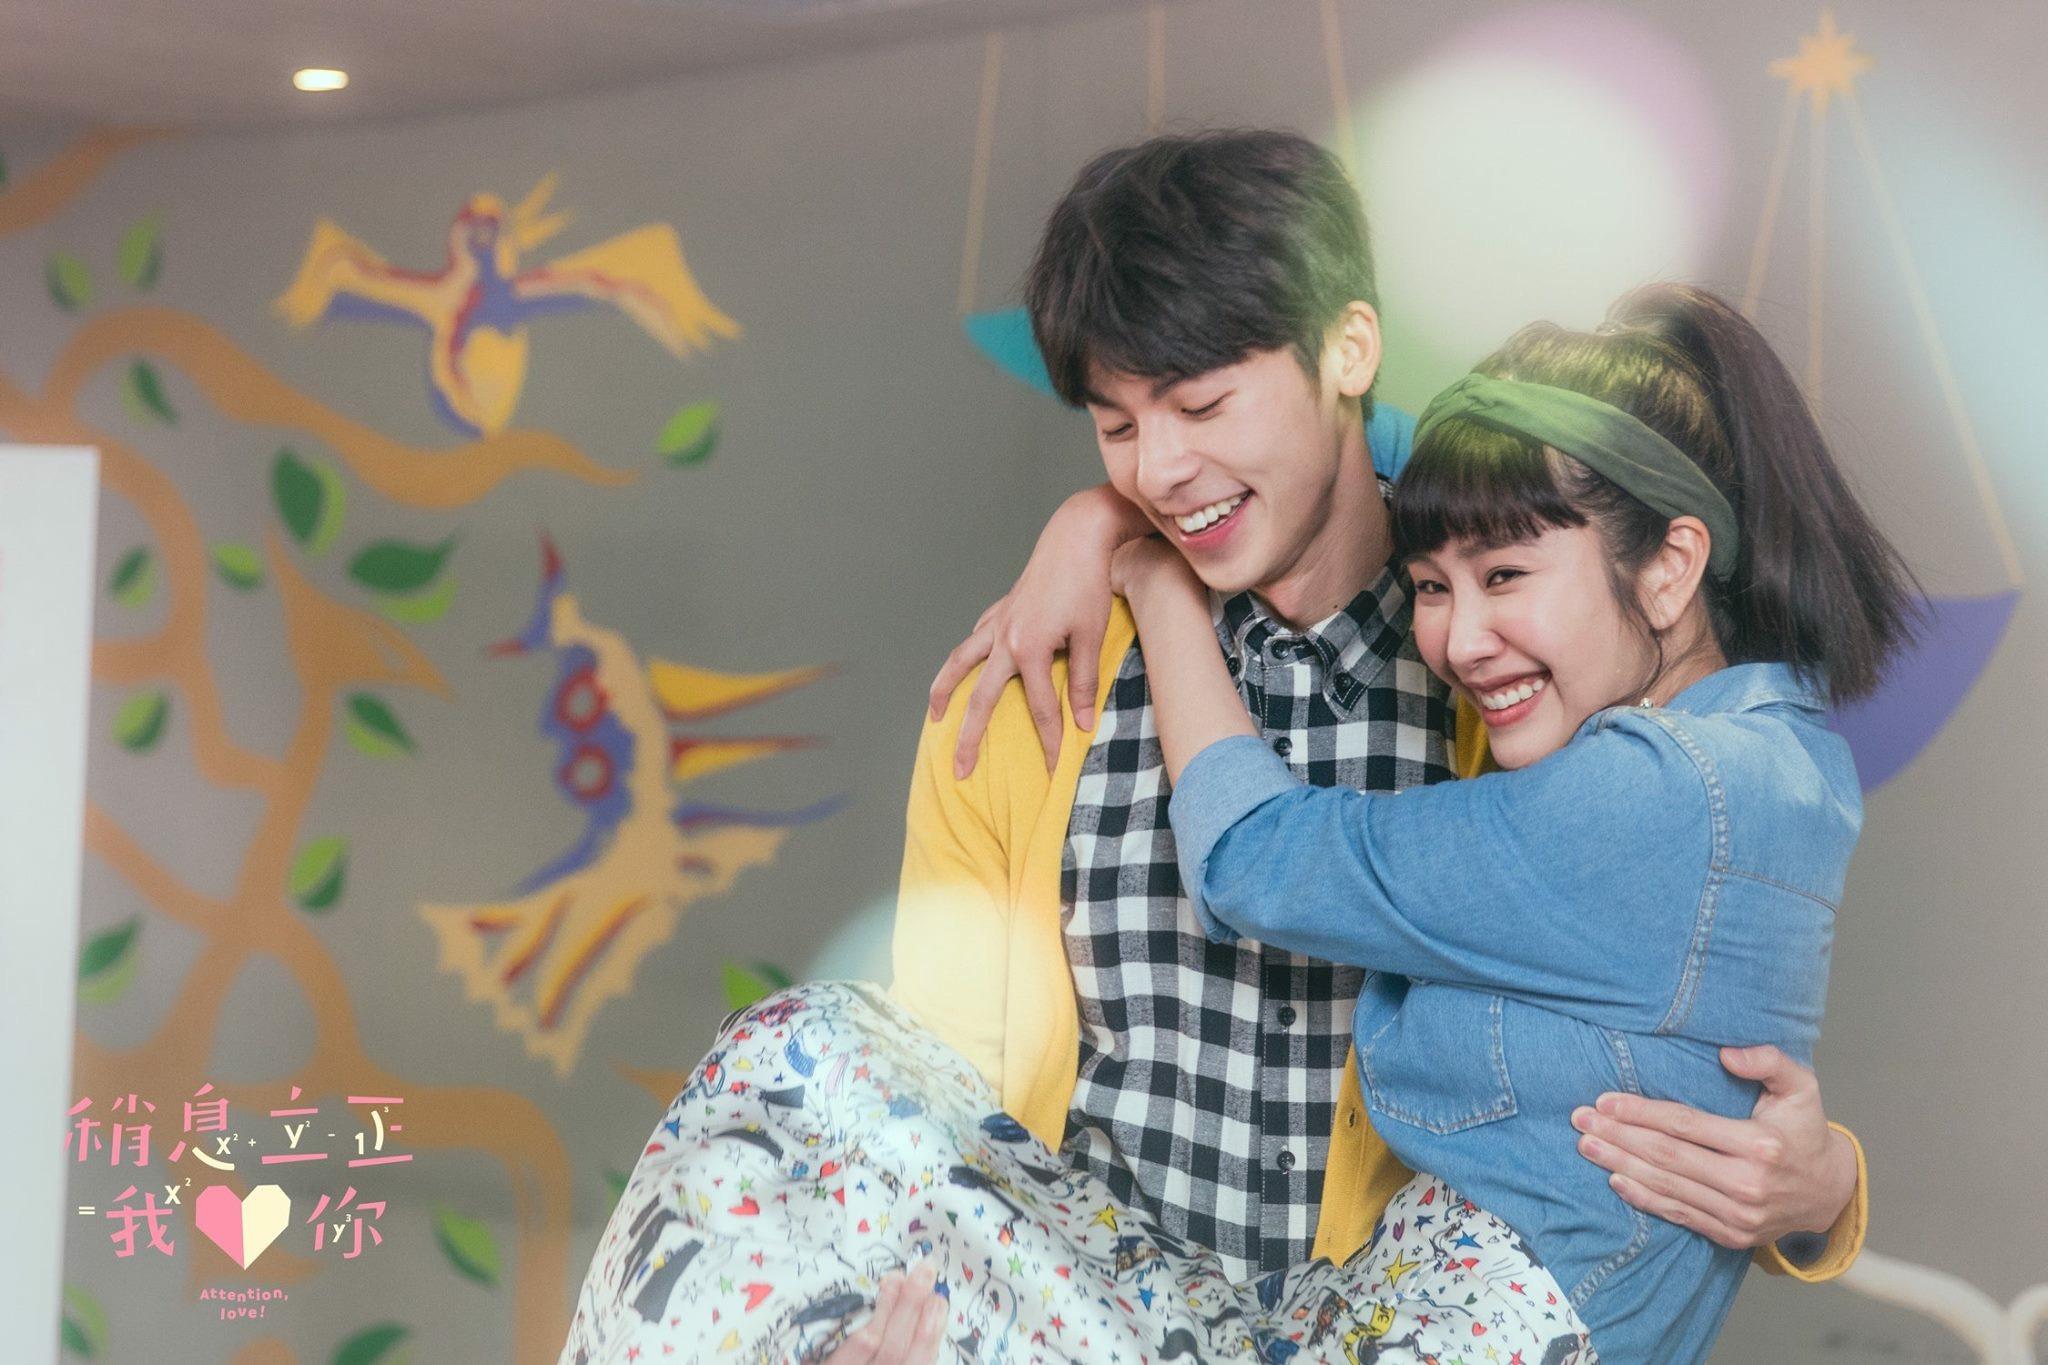 Tiara Huang and Greg Han Hsu in Attention, Love! (2017)